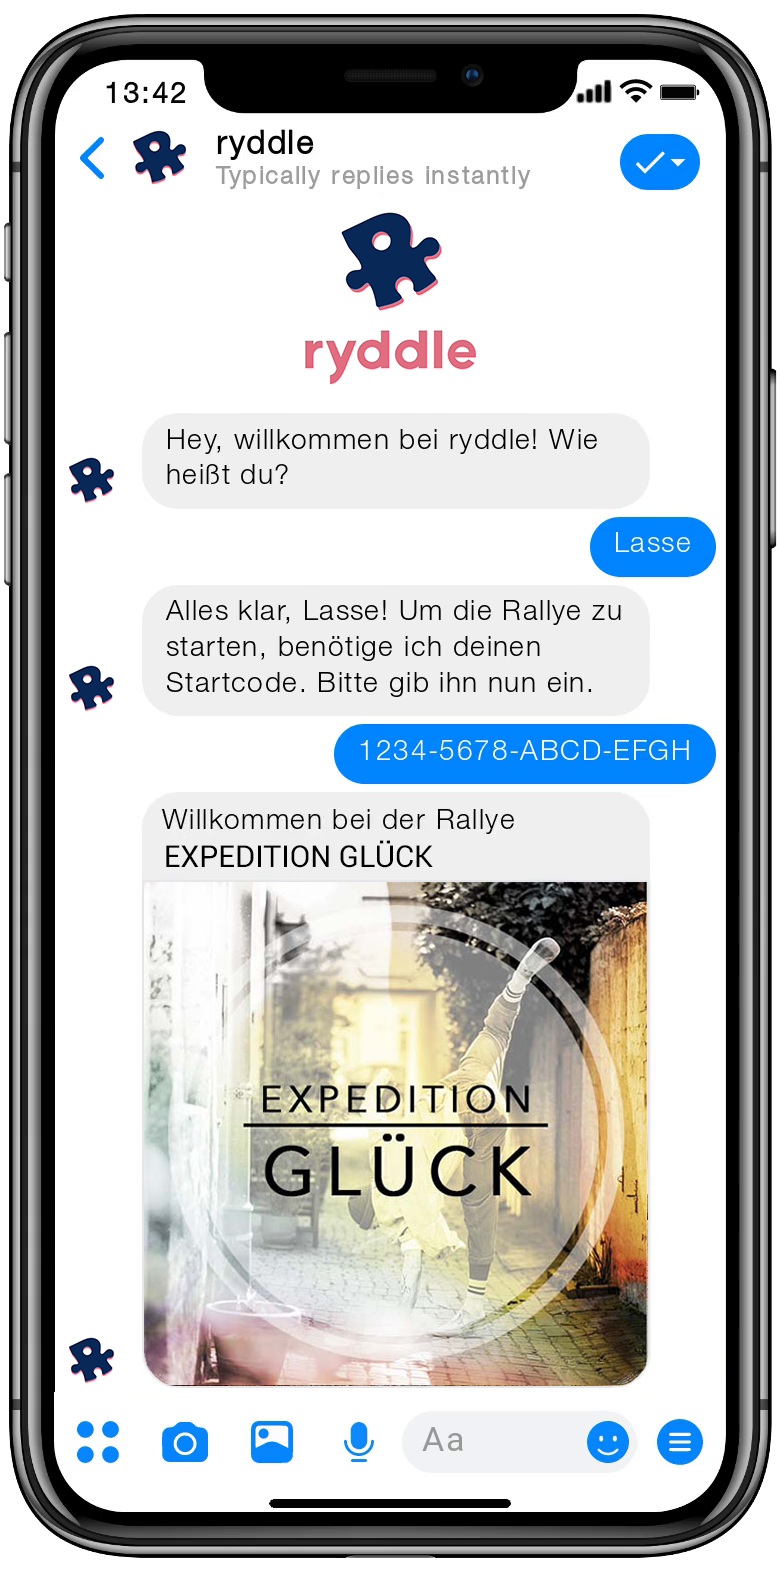 Stadtrallye Lübeck - Vorschau der Smartphone Schnitzeljagd